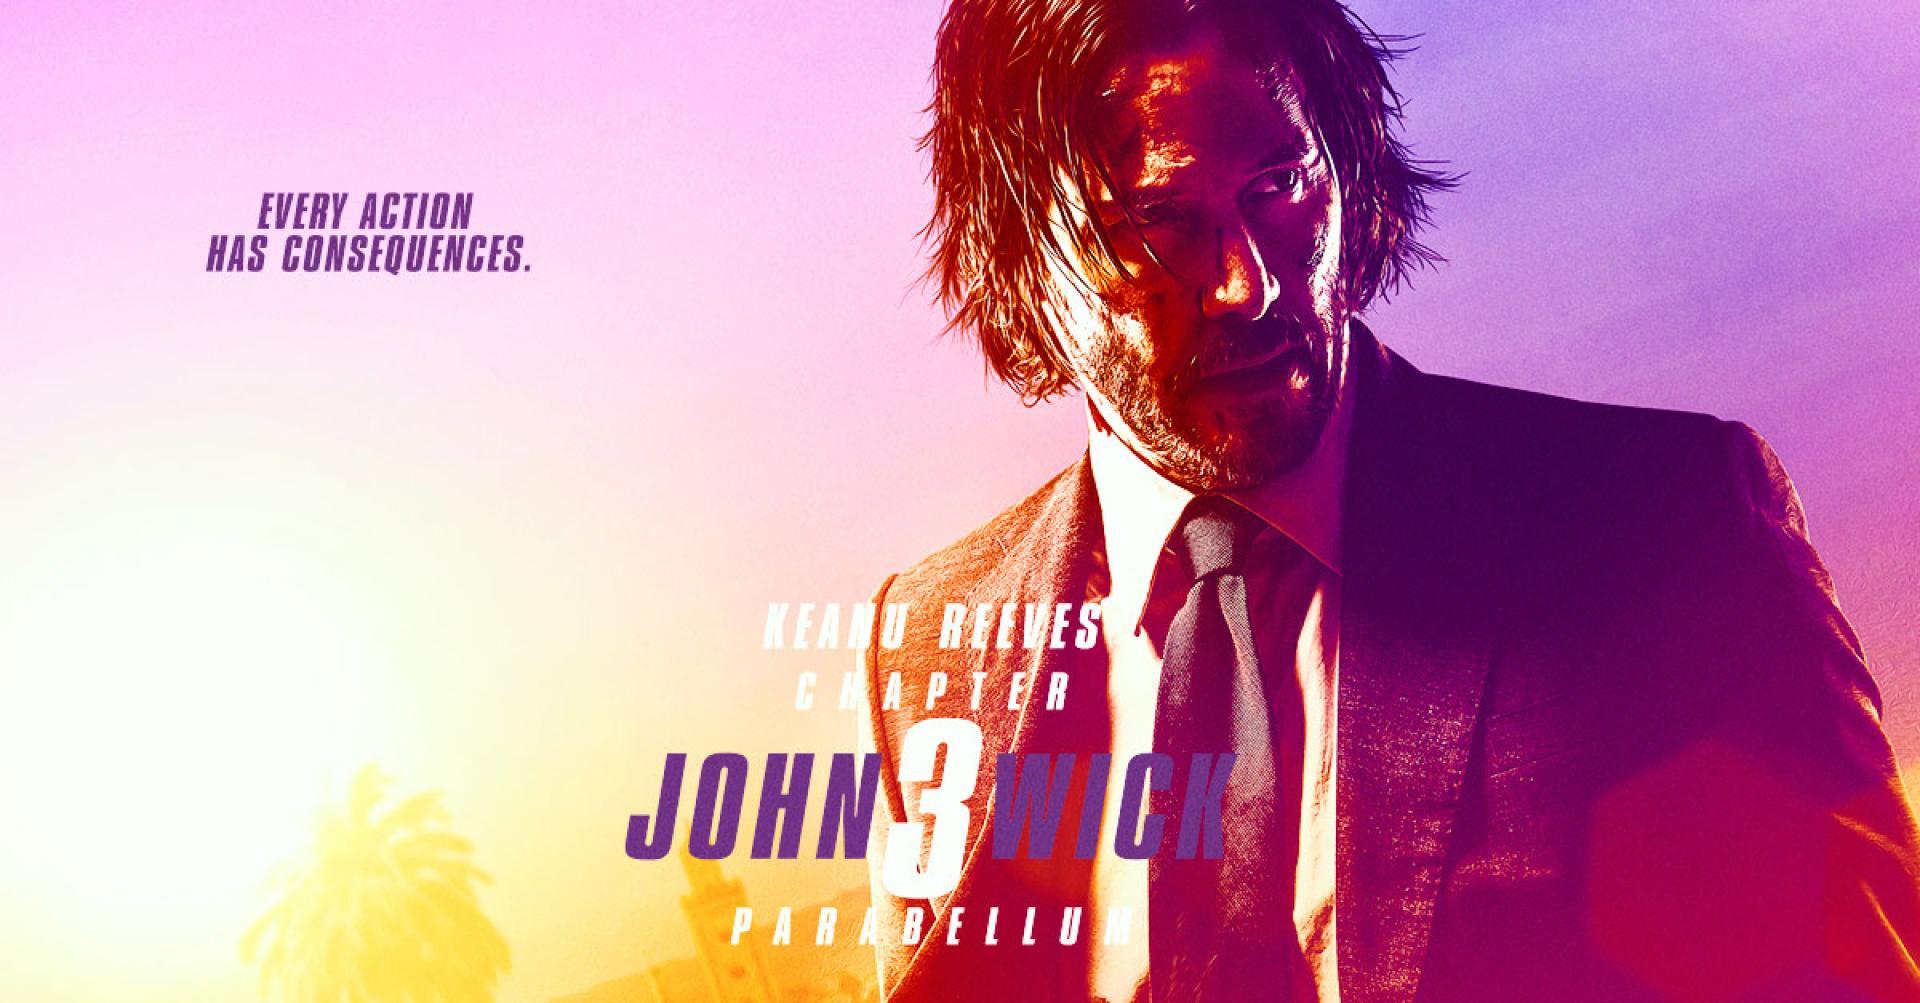 Death Wish Shake XVI. - John Wick: Chapter 3 / John Wick: 3. felvonás – Parabellum (2019)